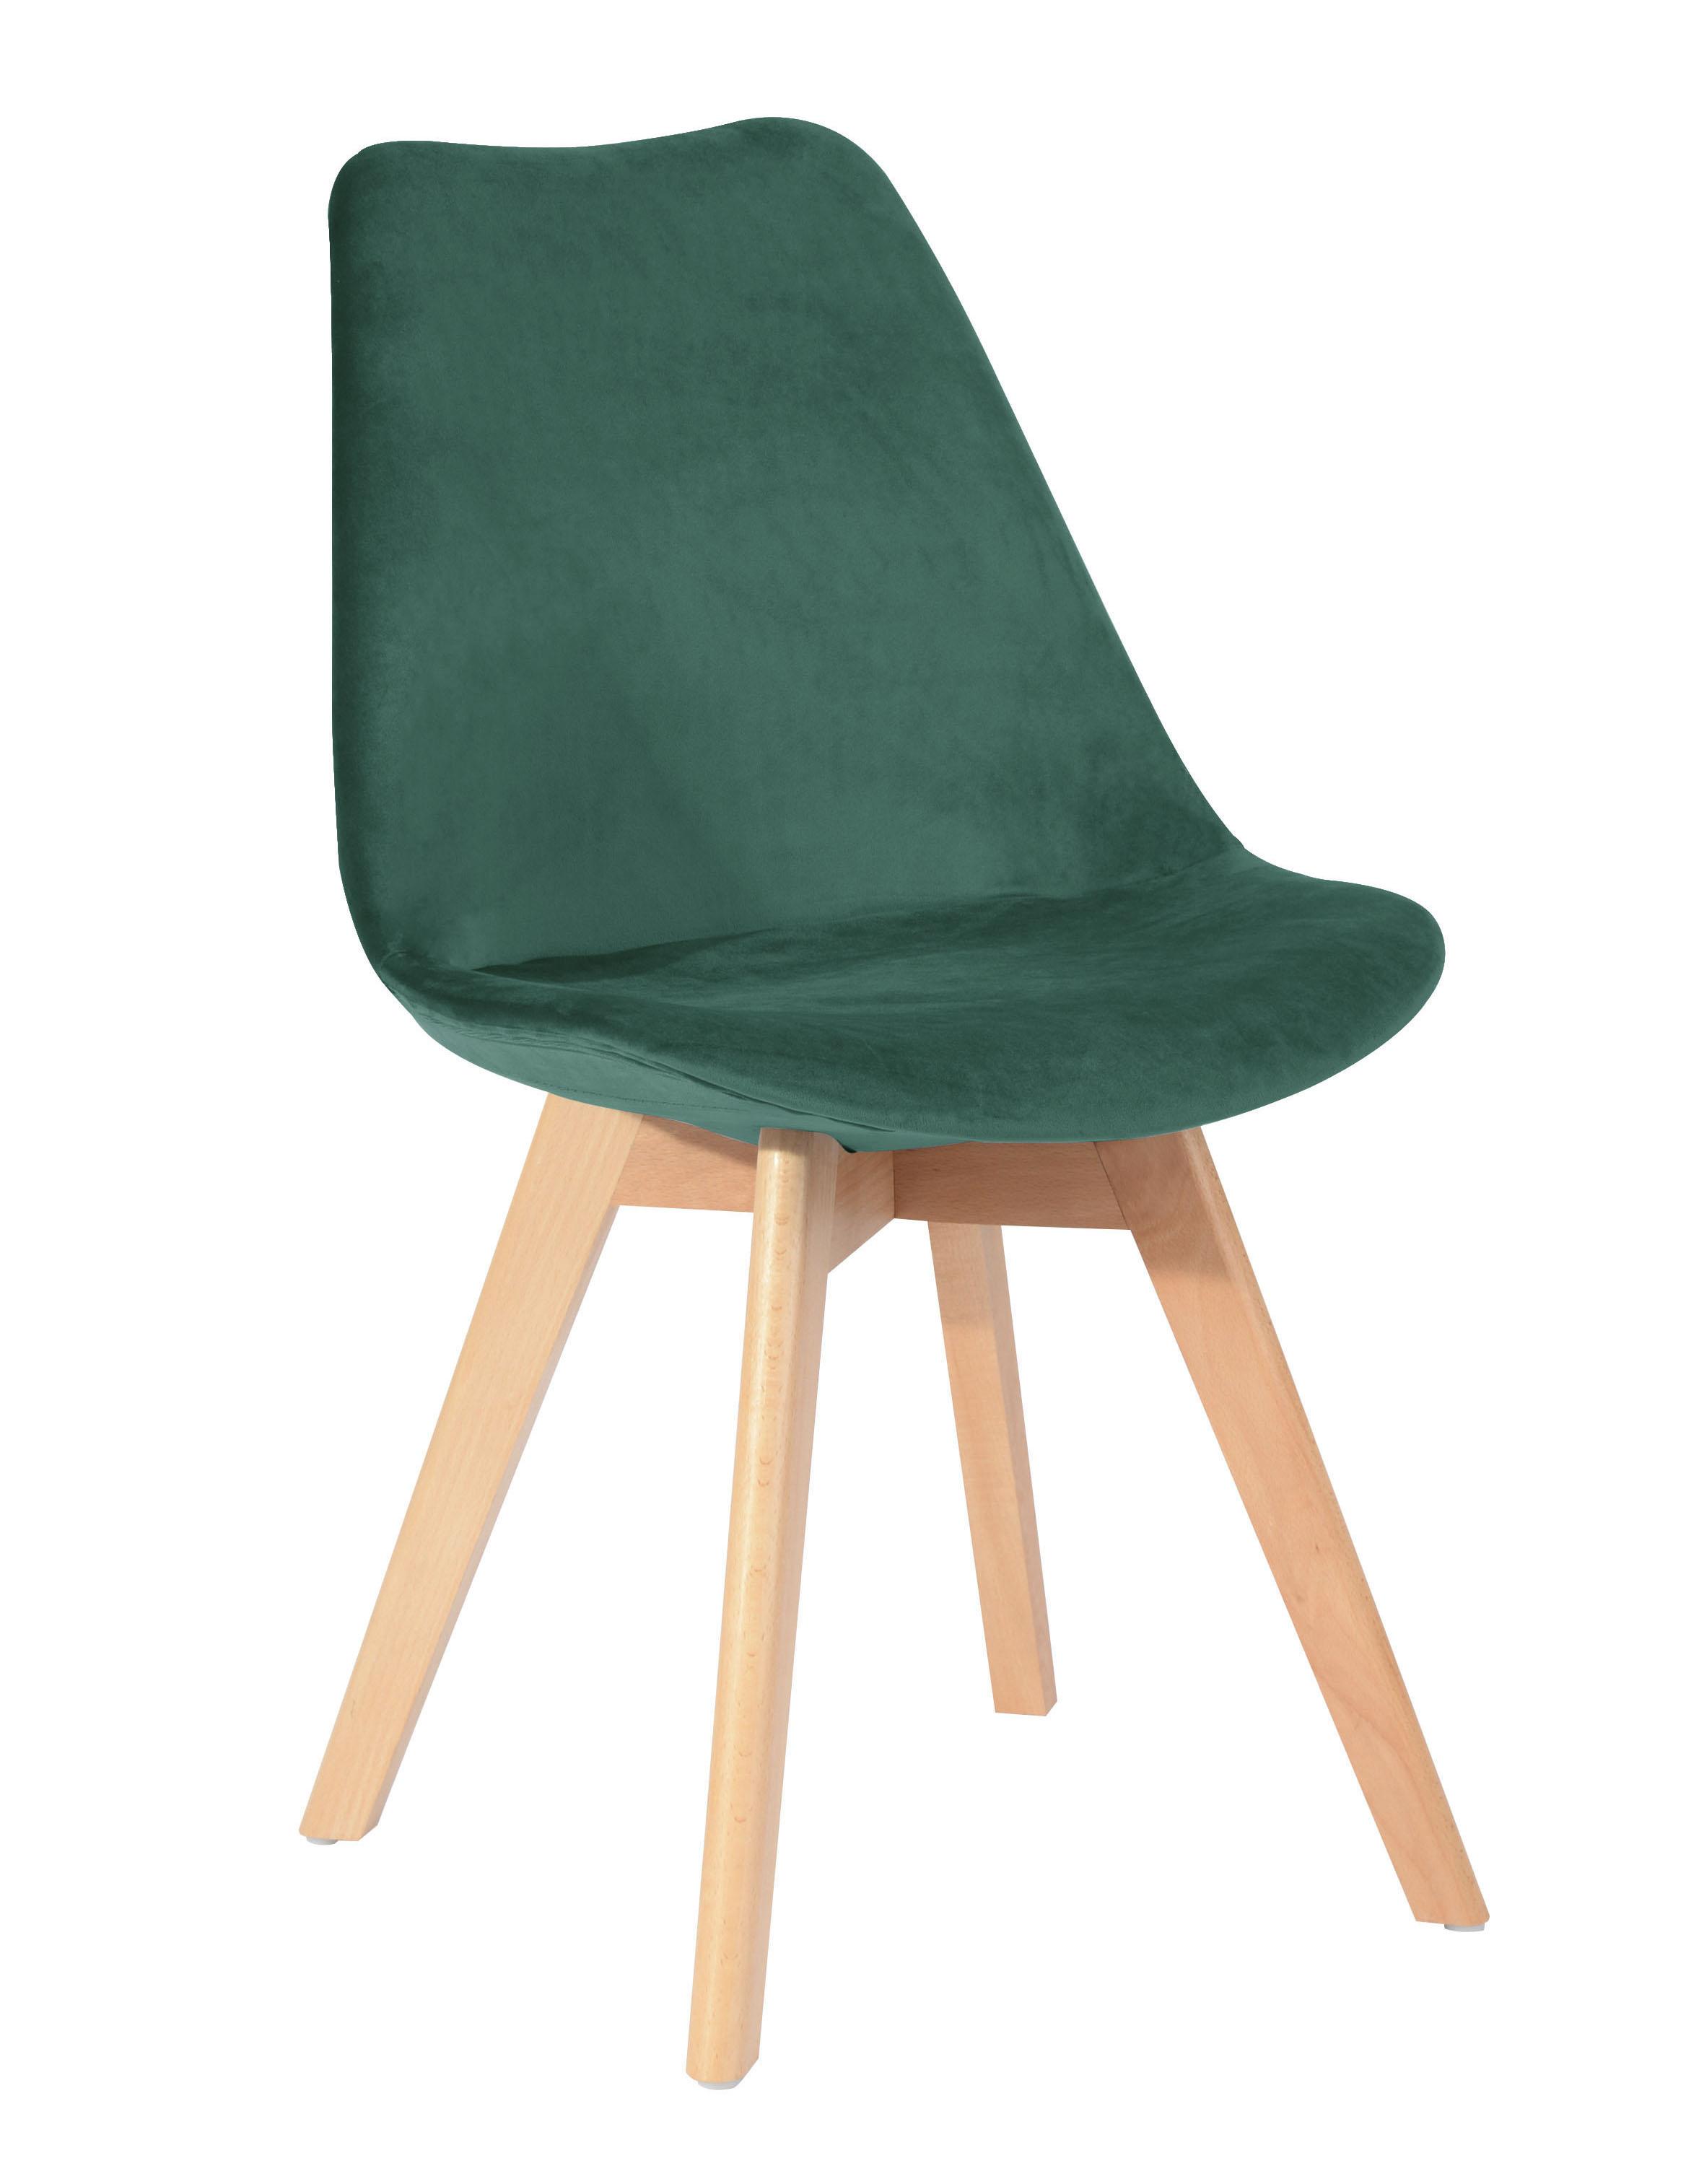 vert velours 49x53xH84cm STOCKHOLM Chaise en scandinave émeraude 3ARL54jq